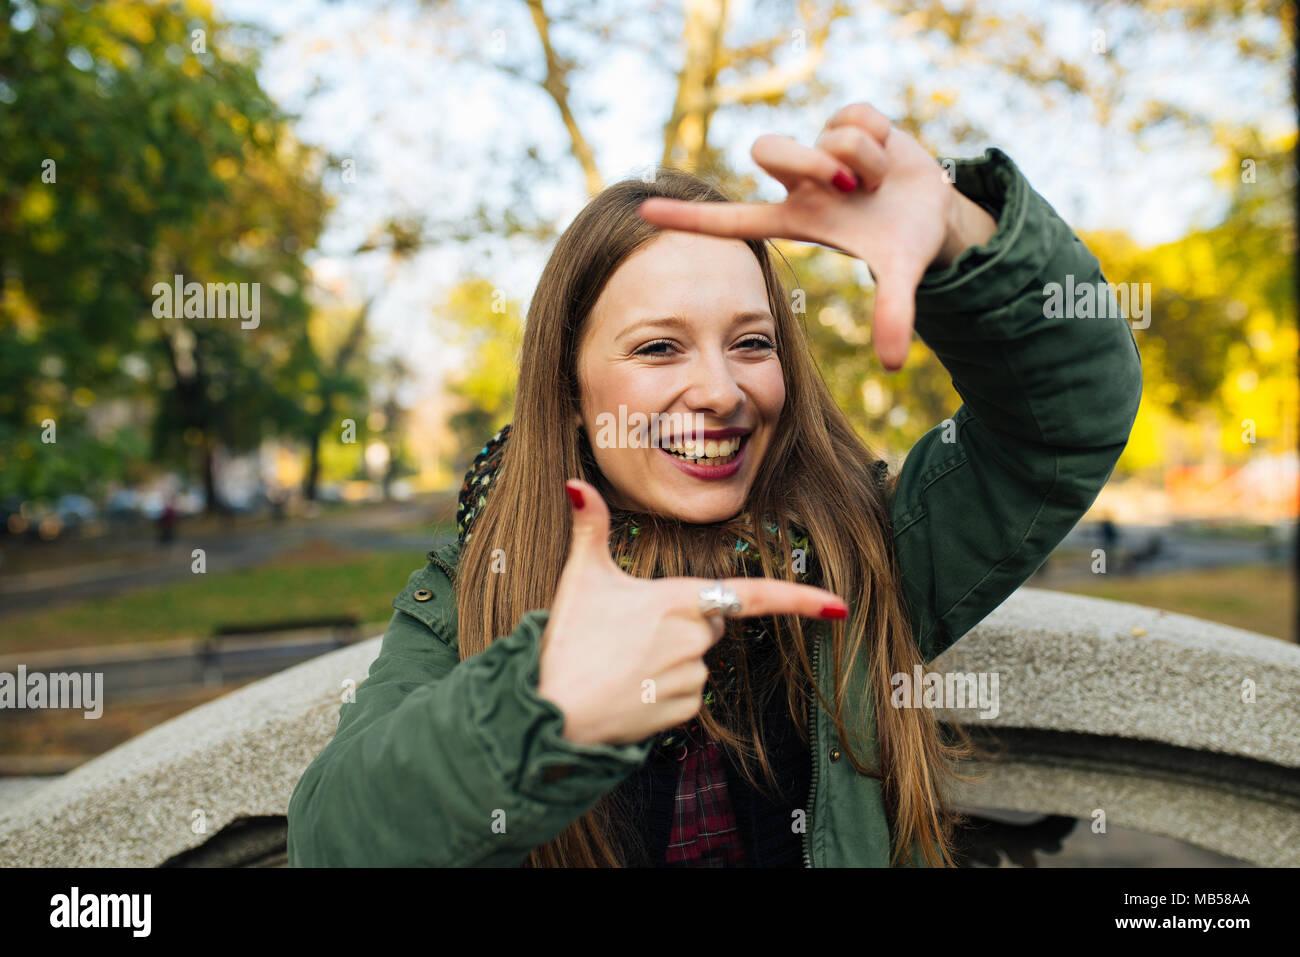 Attraktive junge Frau im grünen Mantel, finger Rahmen im Freien ...